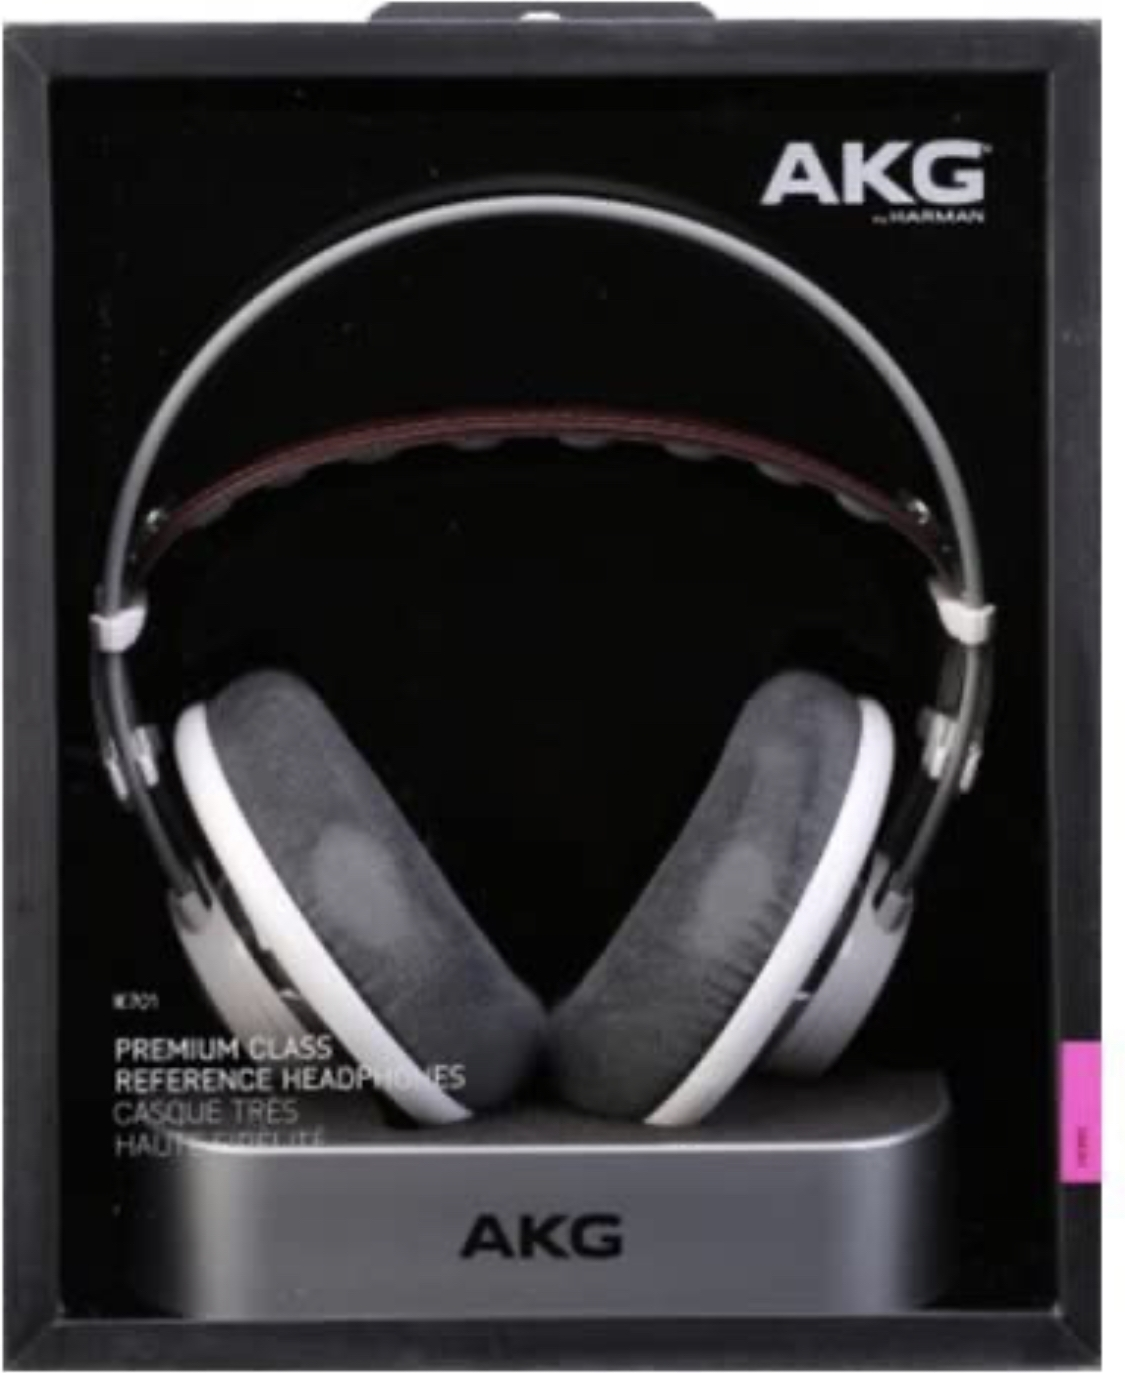 AKG K701 Appearance